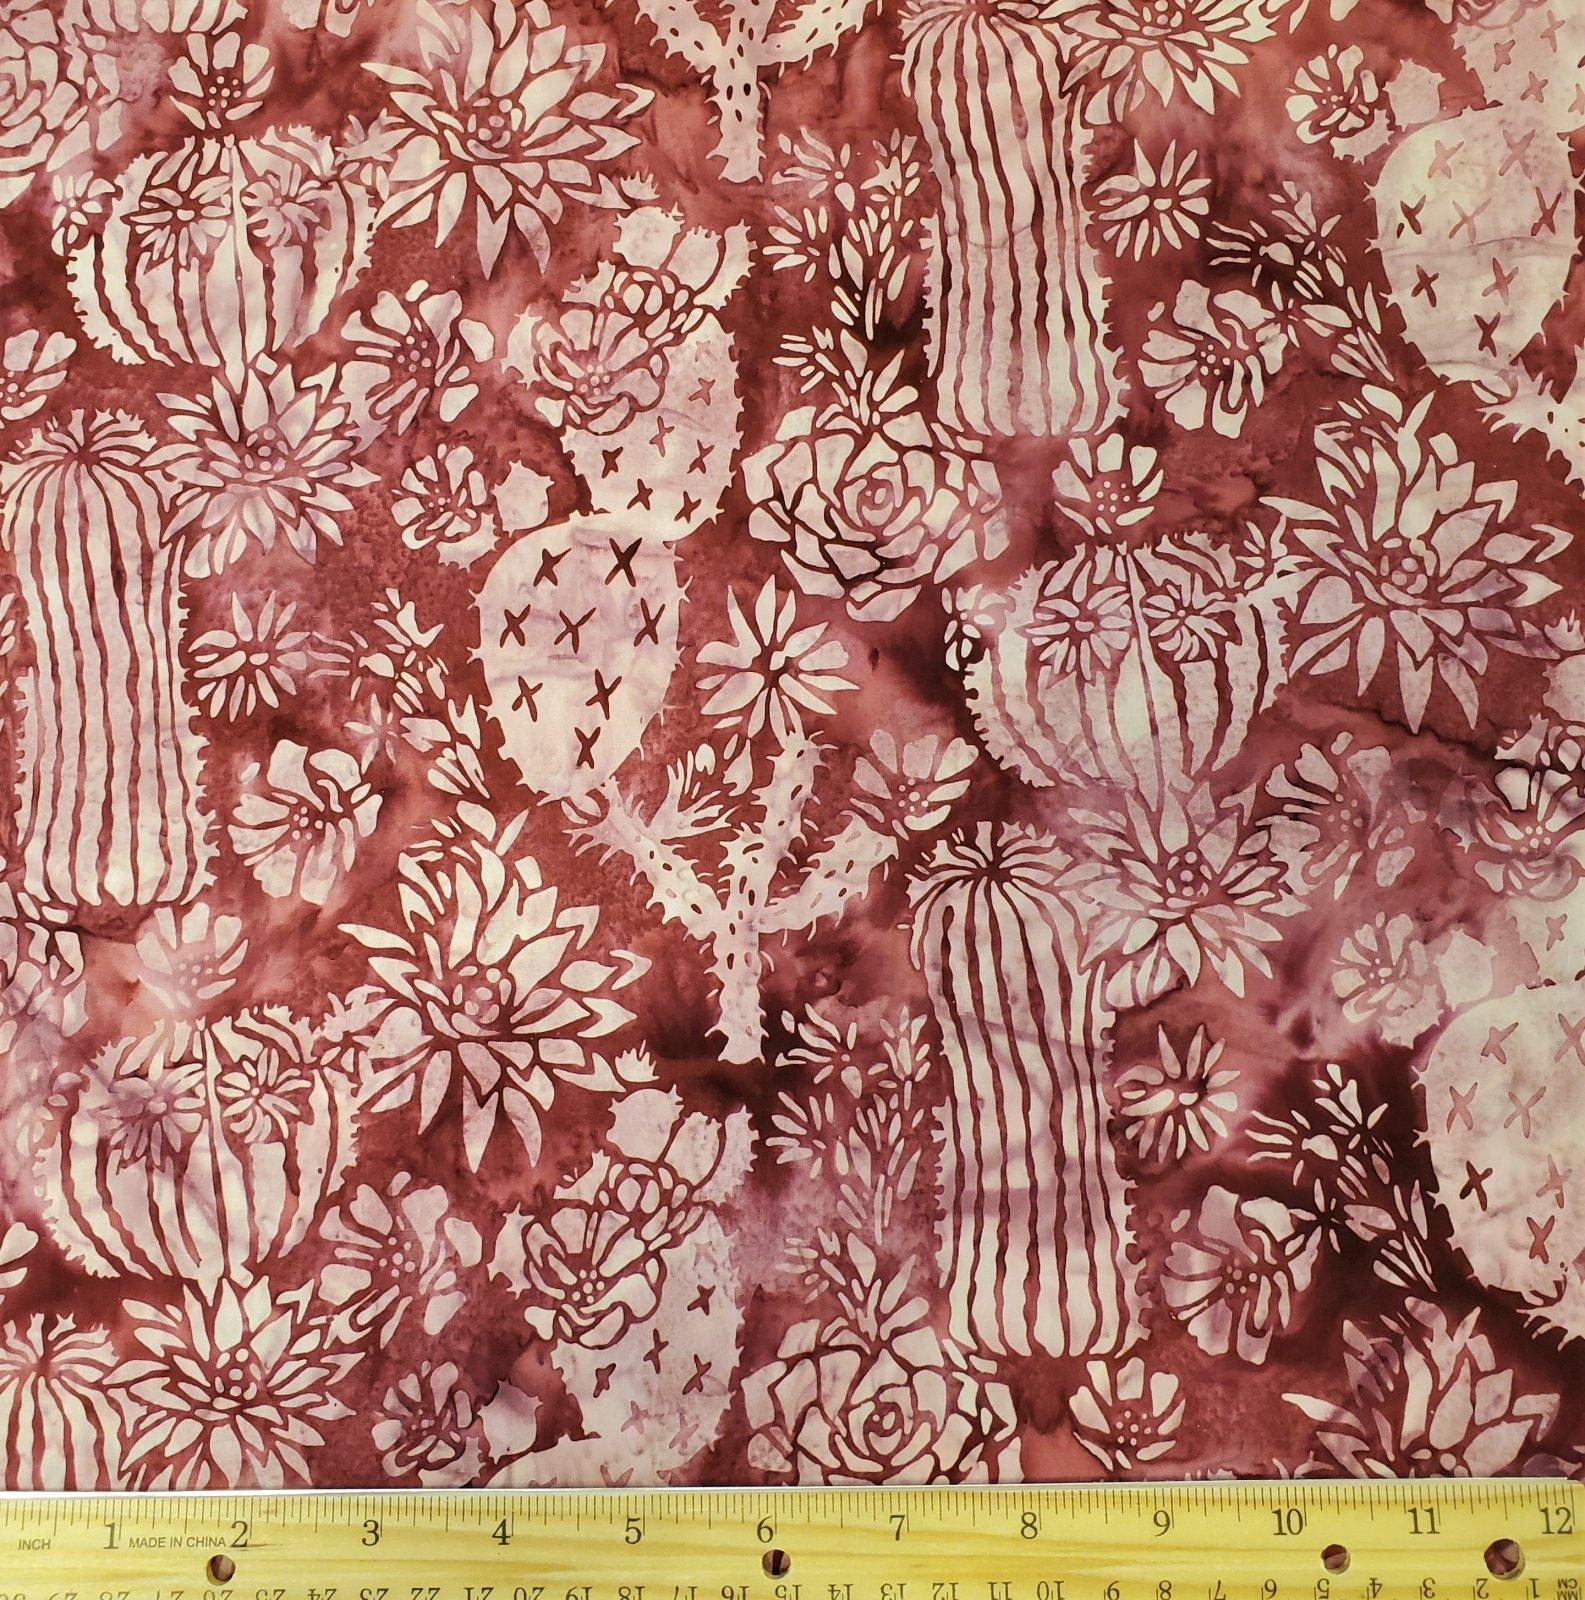 Bali Chop Custom Cactus Blooms - Blooms - R2266-562